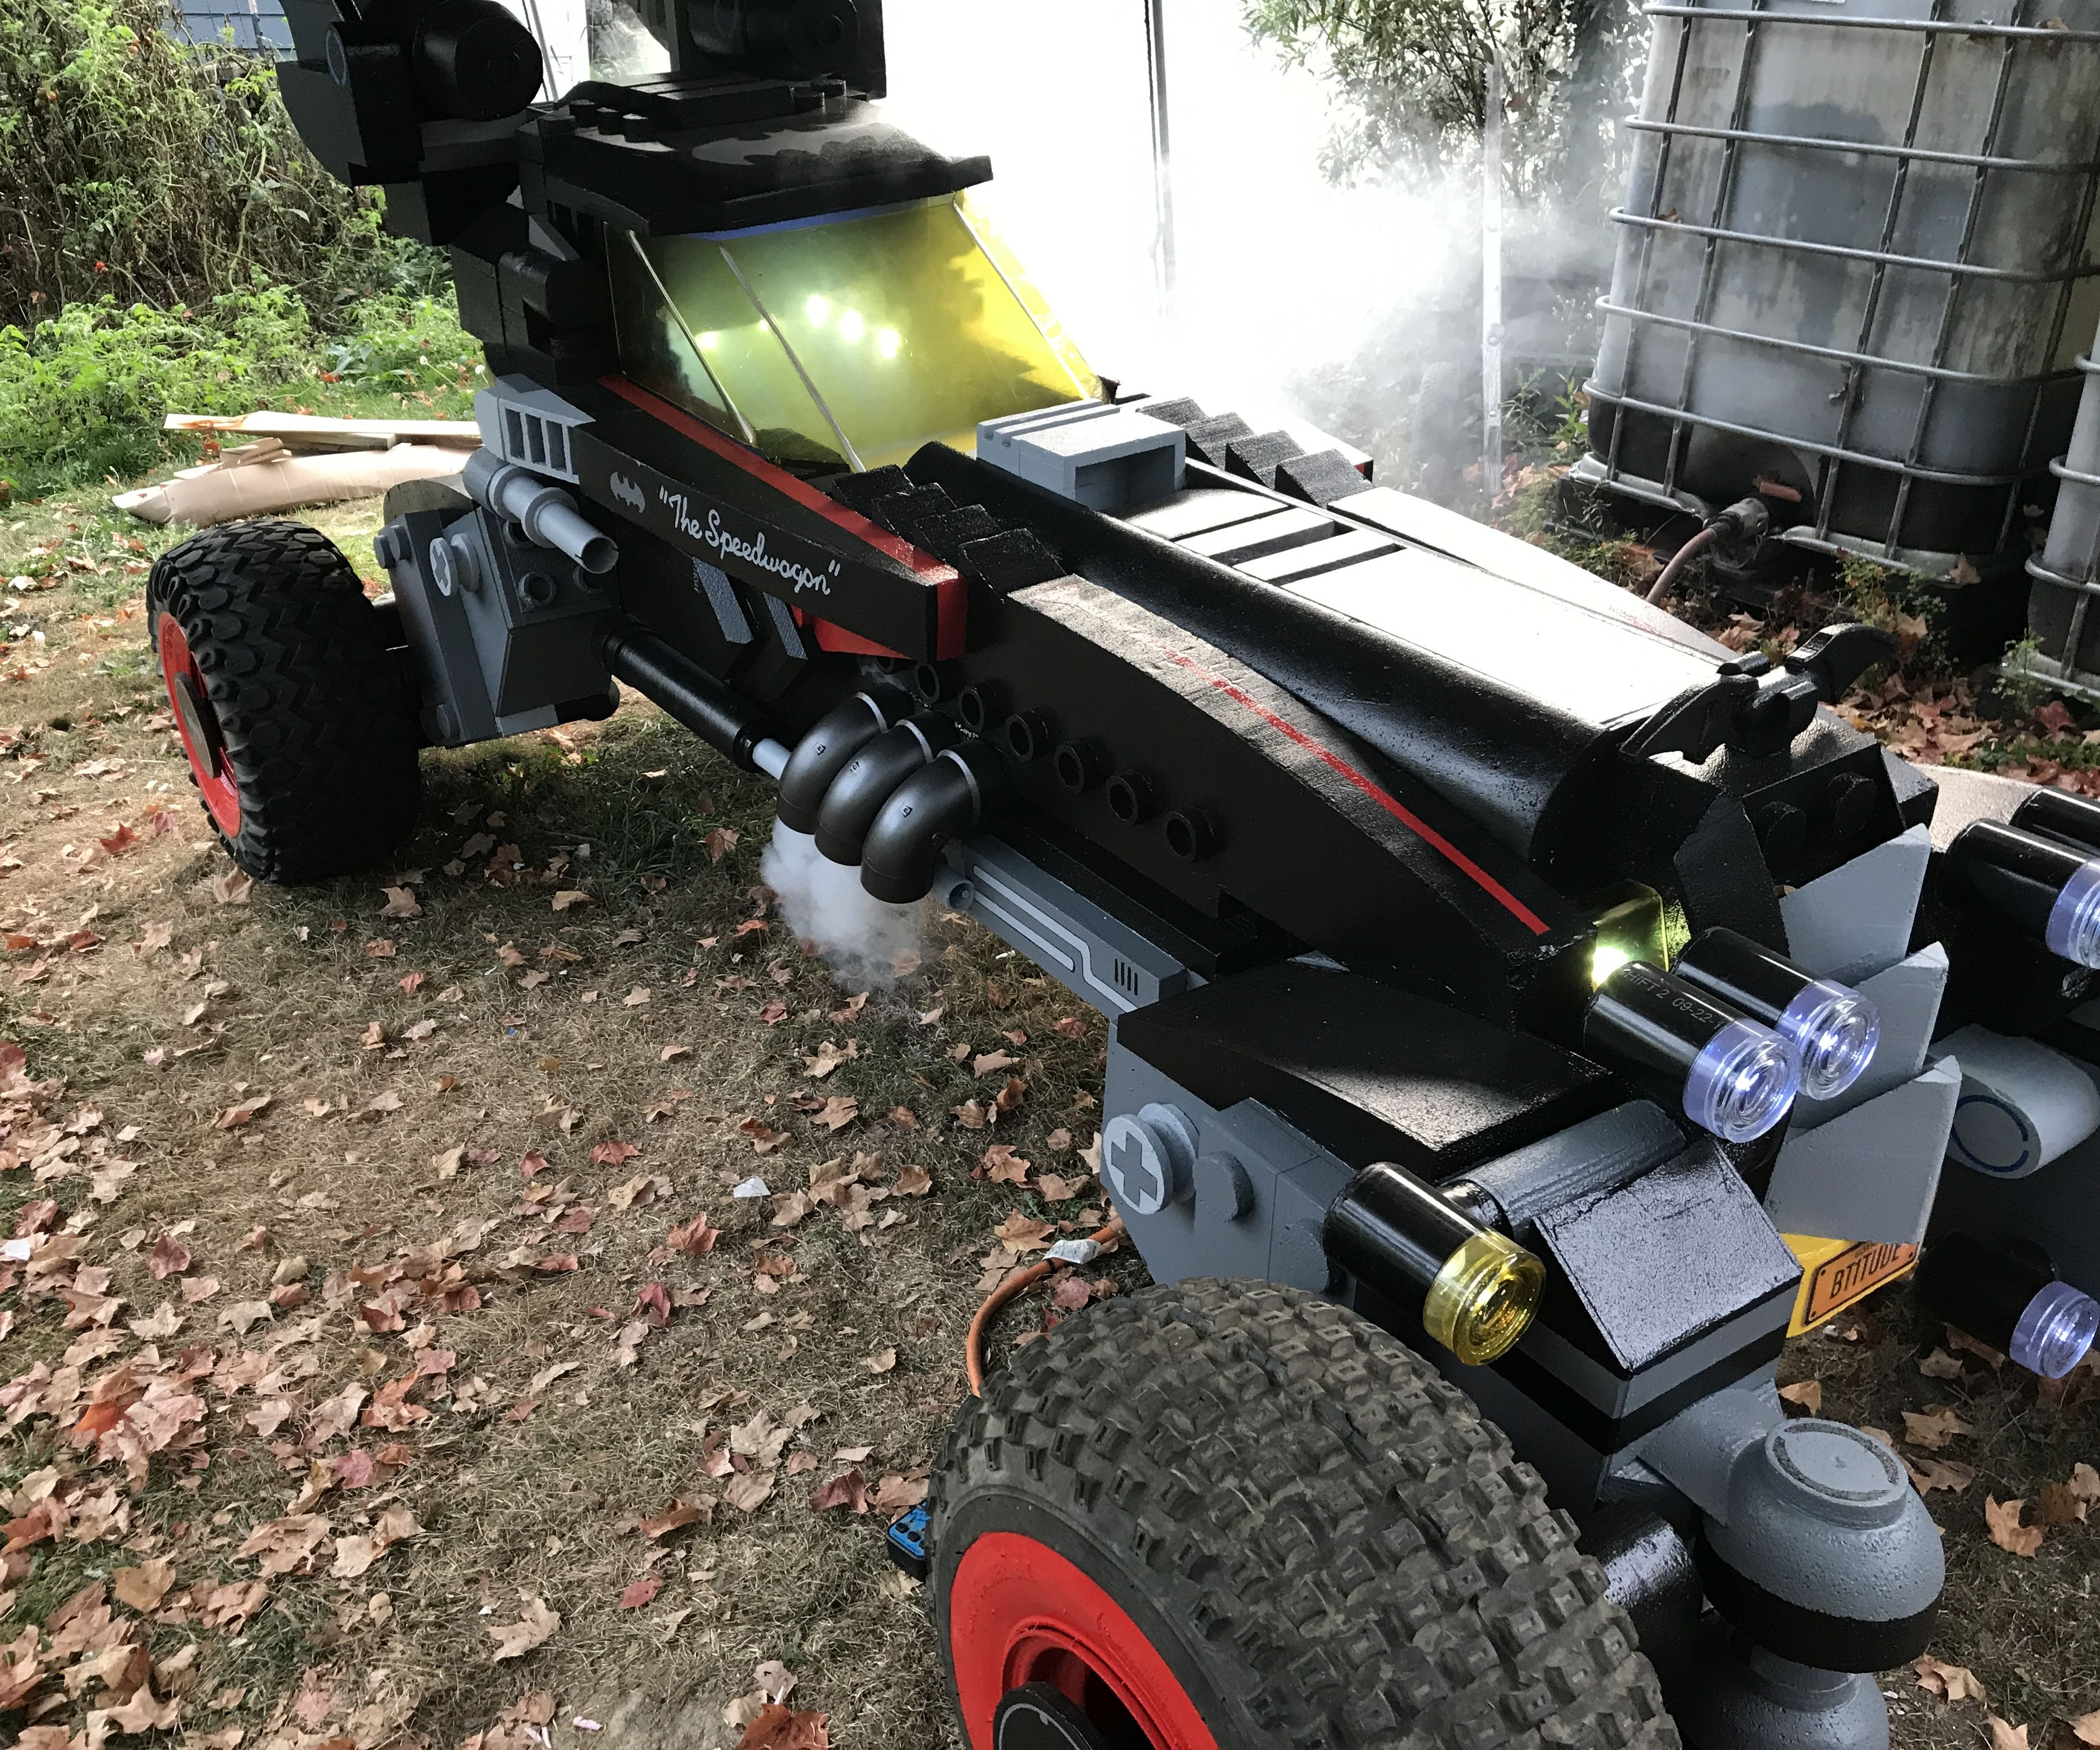 Life Size LEGO Batman Movie Batmobile